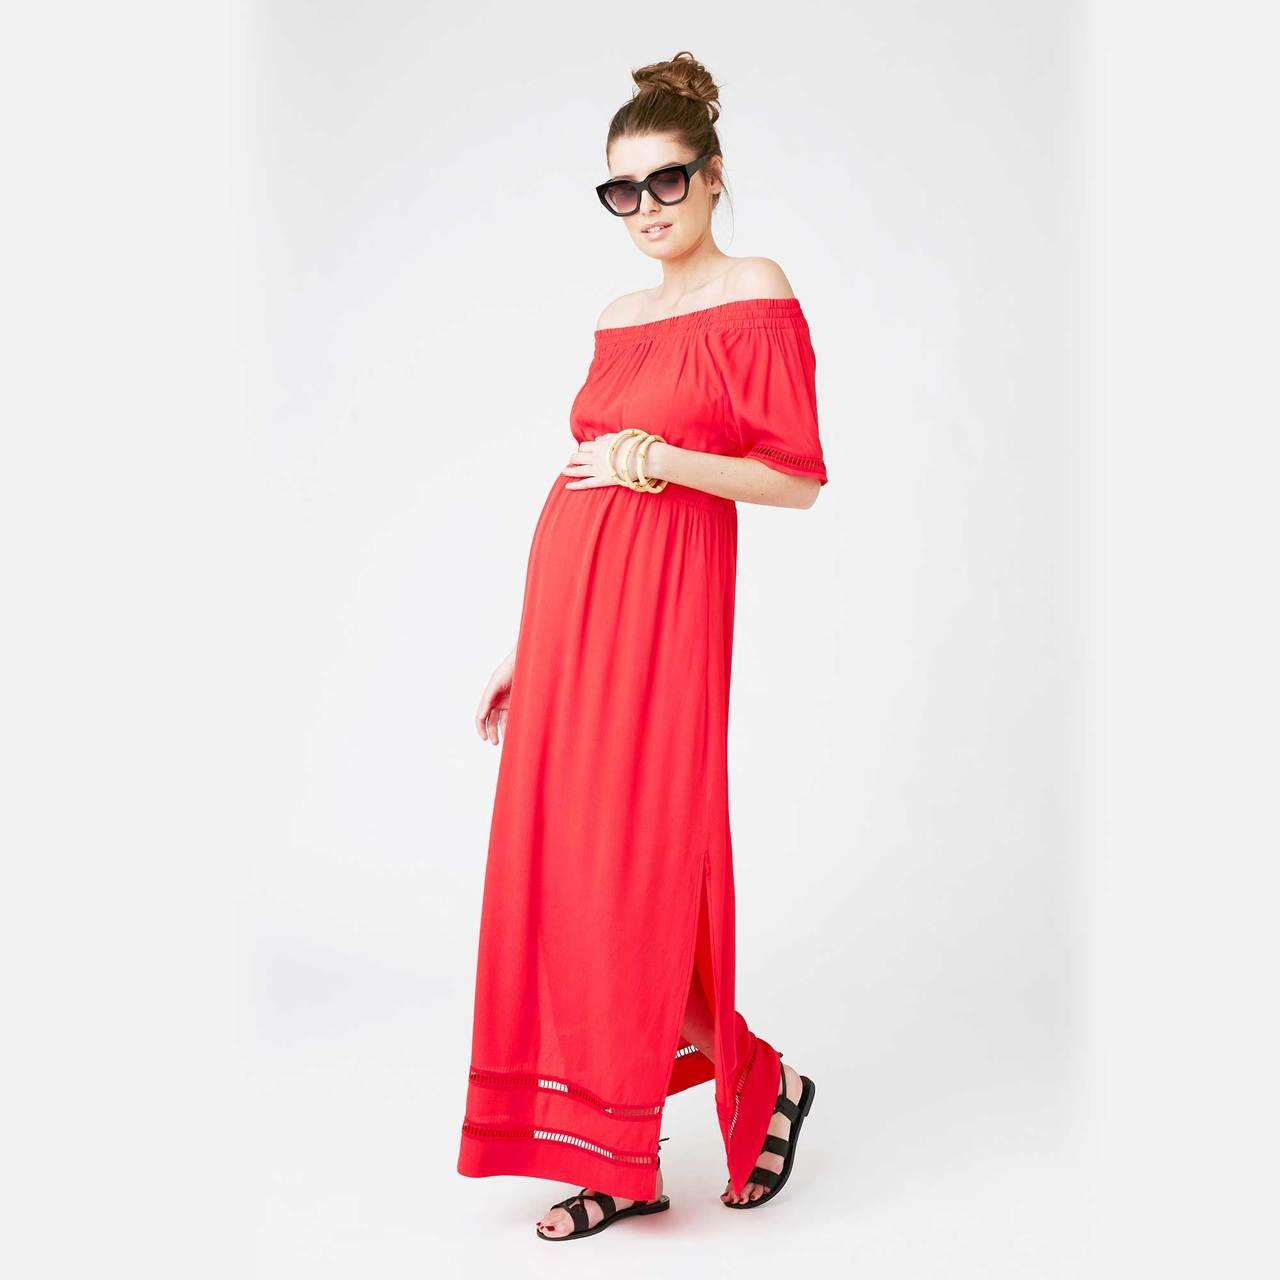 42c84c056d5 Buy Ripe Maternity Stripe Cold Shoulder Maxi Dress - Peekaboo Baby ...